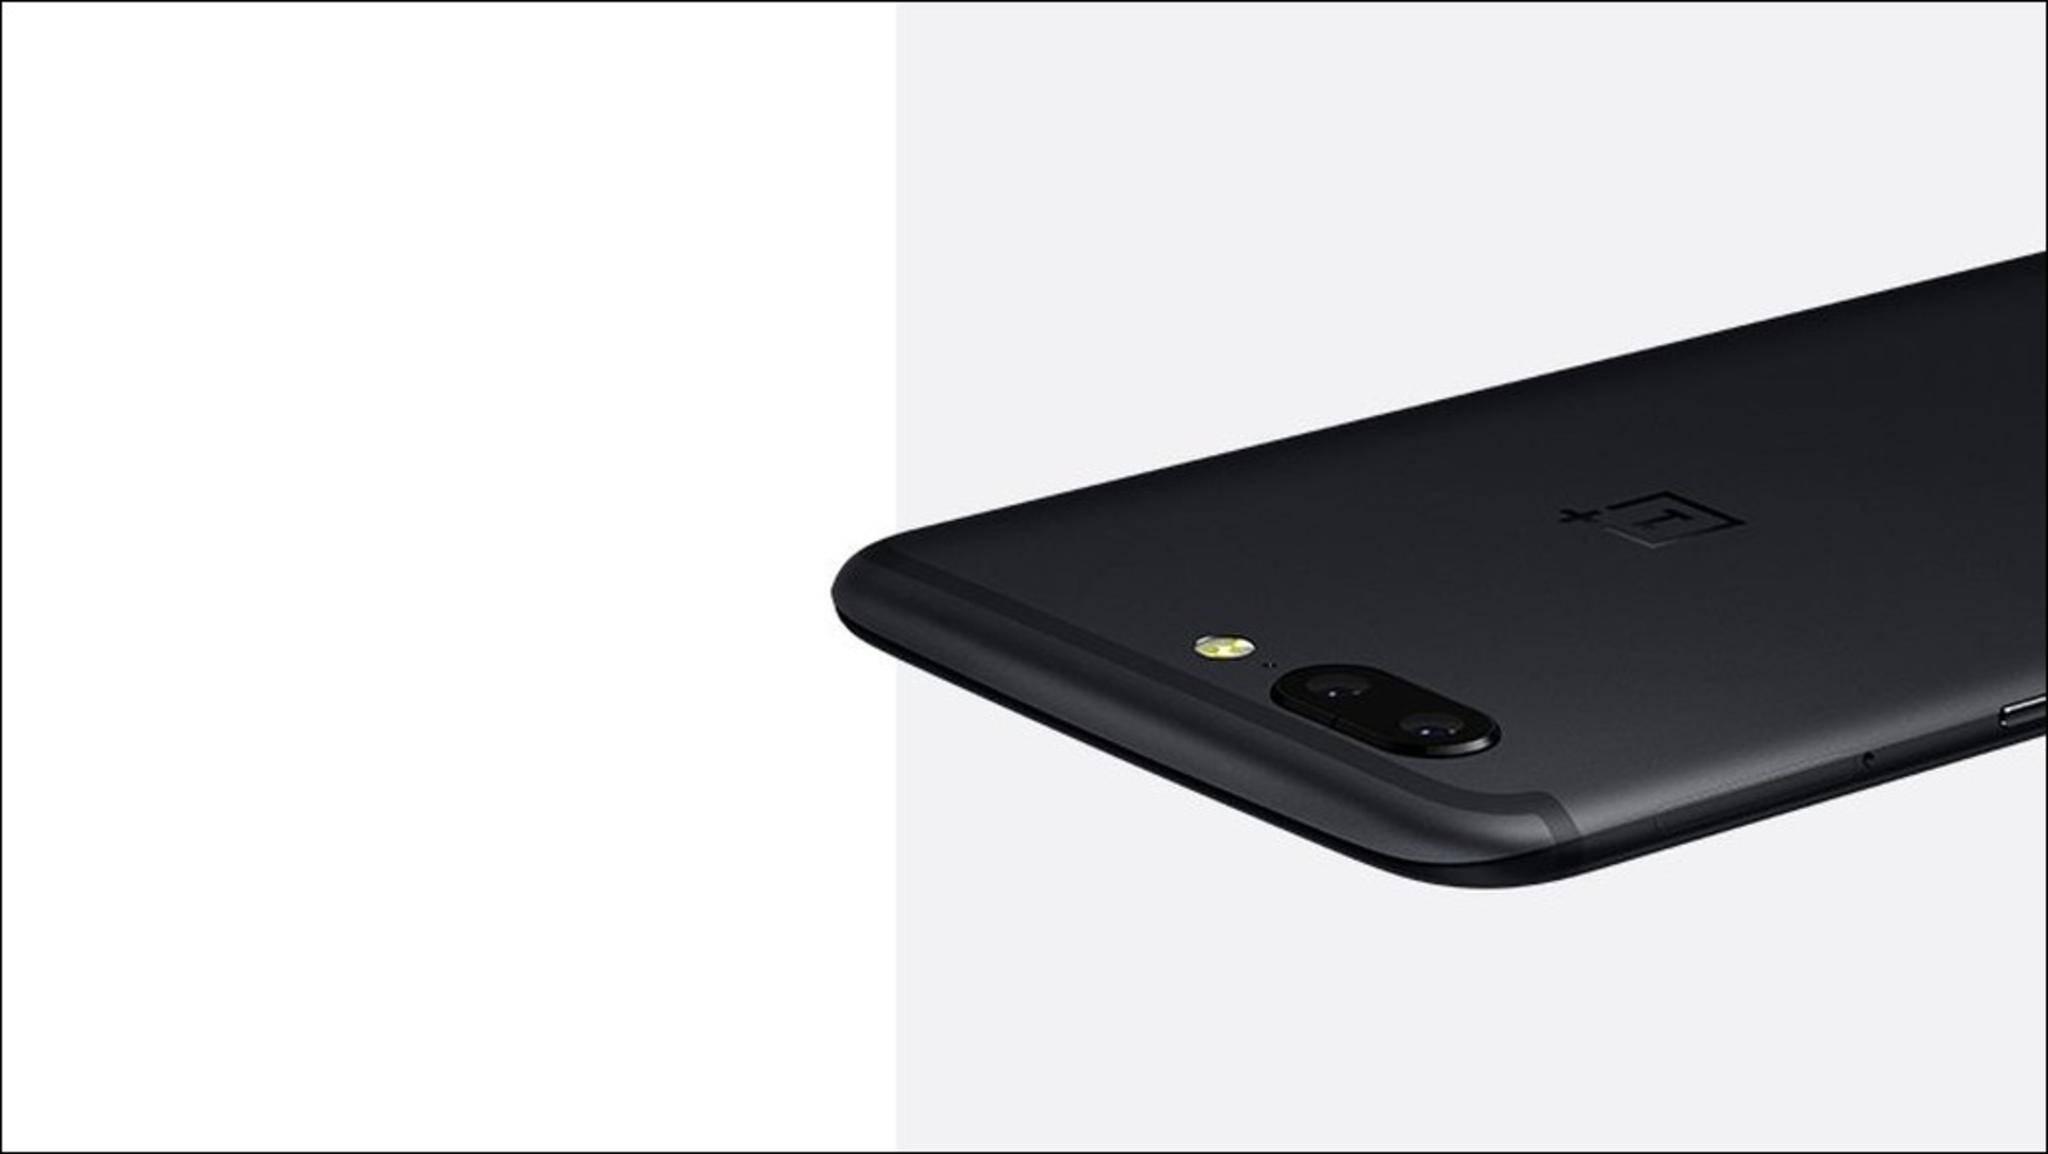 OnePlus-5-Smartphone